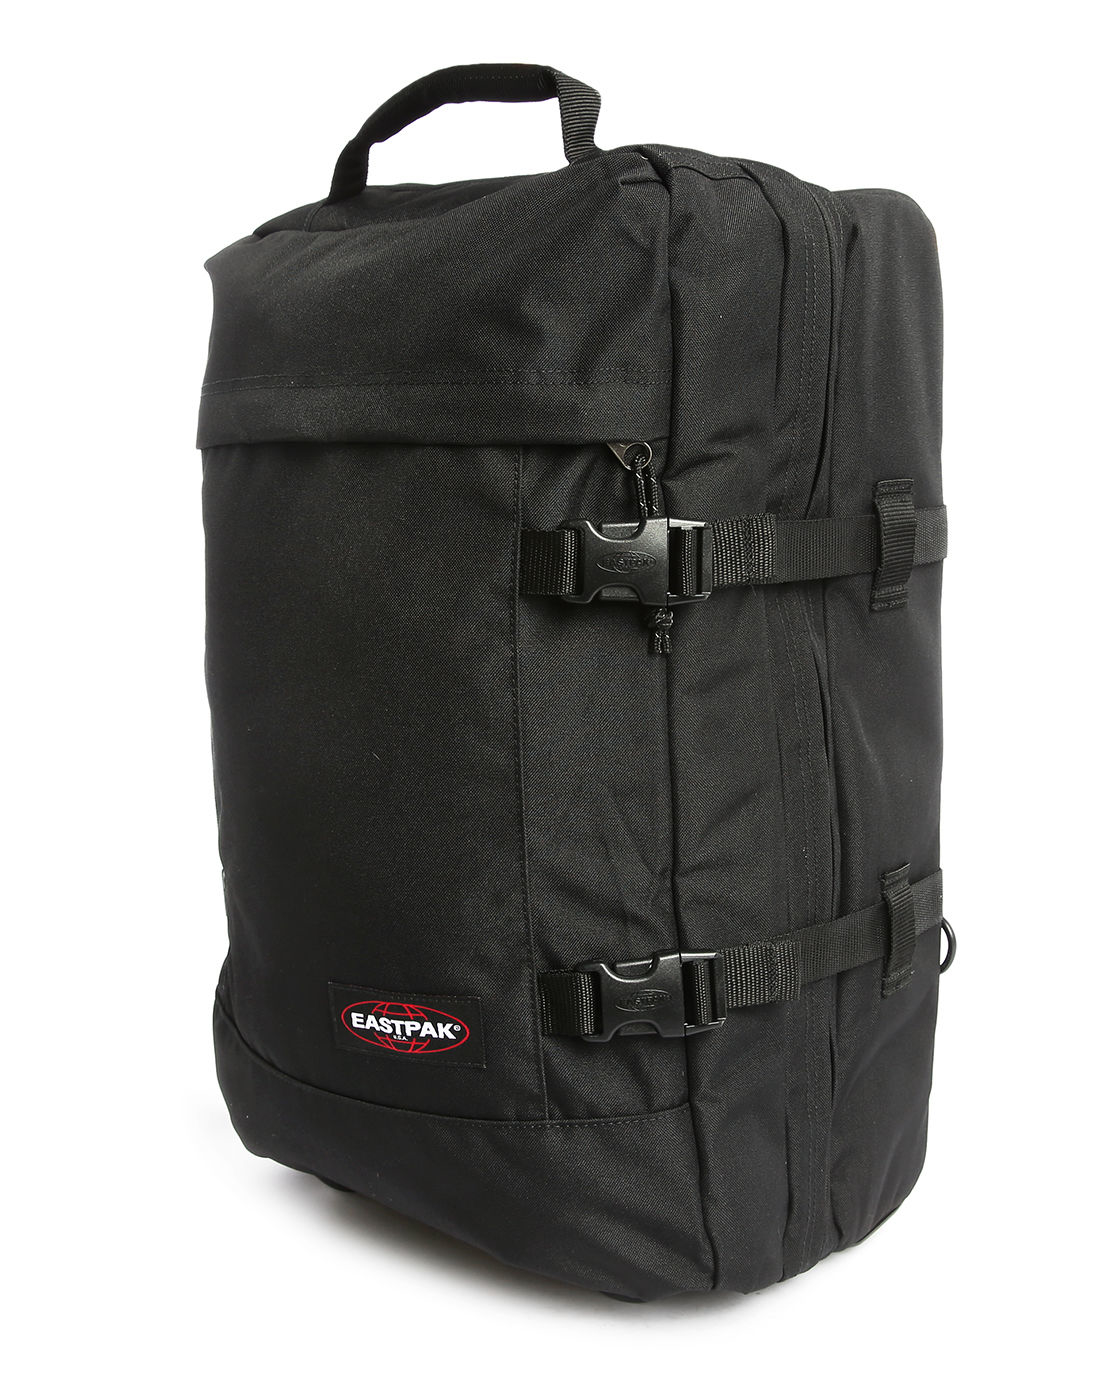 Eastpak Rolling Backpack | Cg Backpacks